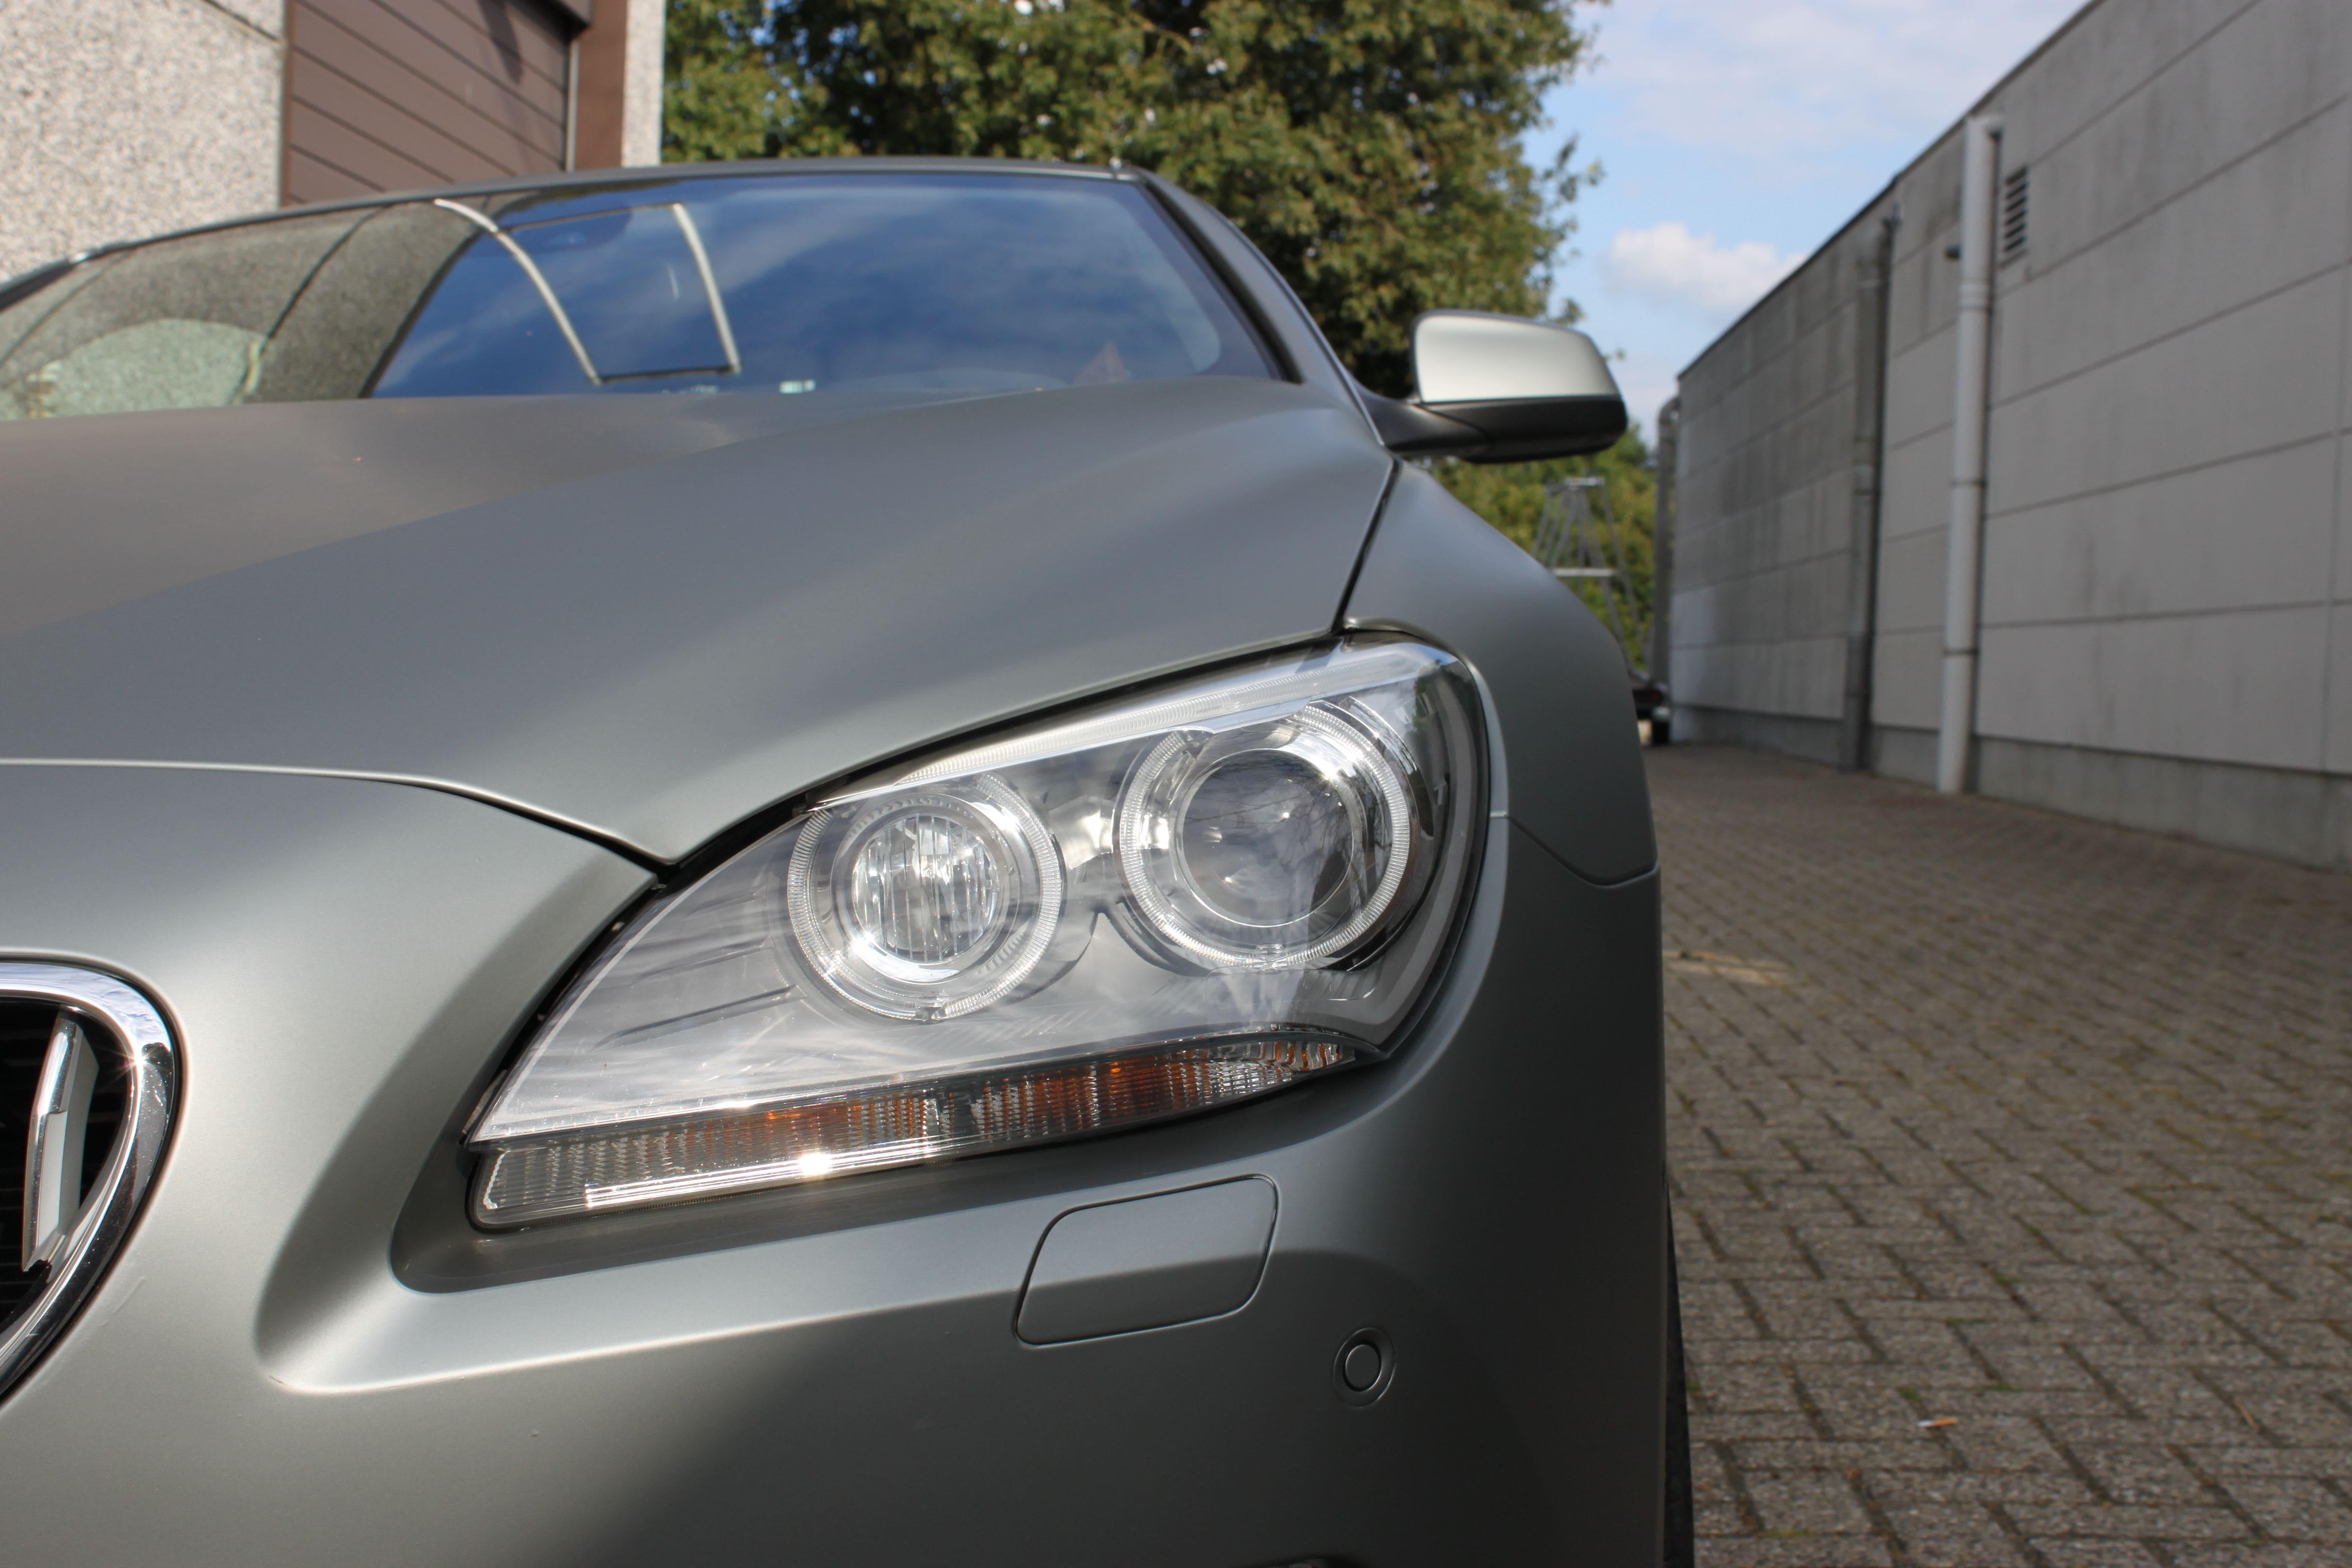 BMW 650i met Mat Antraciet Metallic Avery Wrap, Carwrapping door Wrapmyride.nu Foto-nr:5284, ©2020